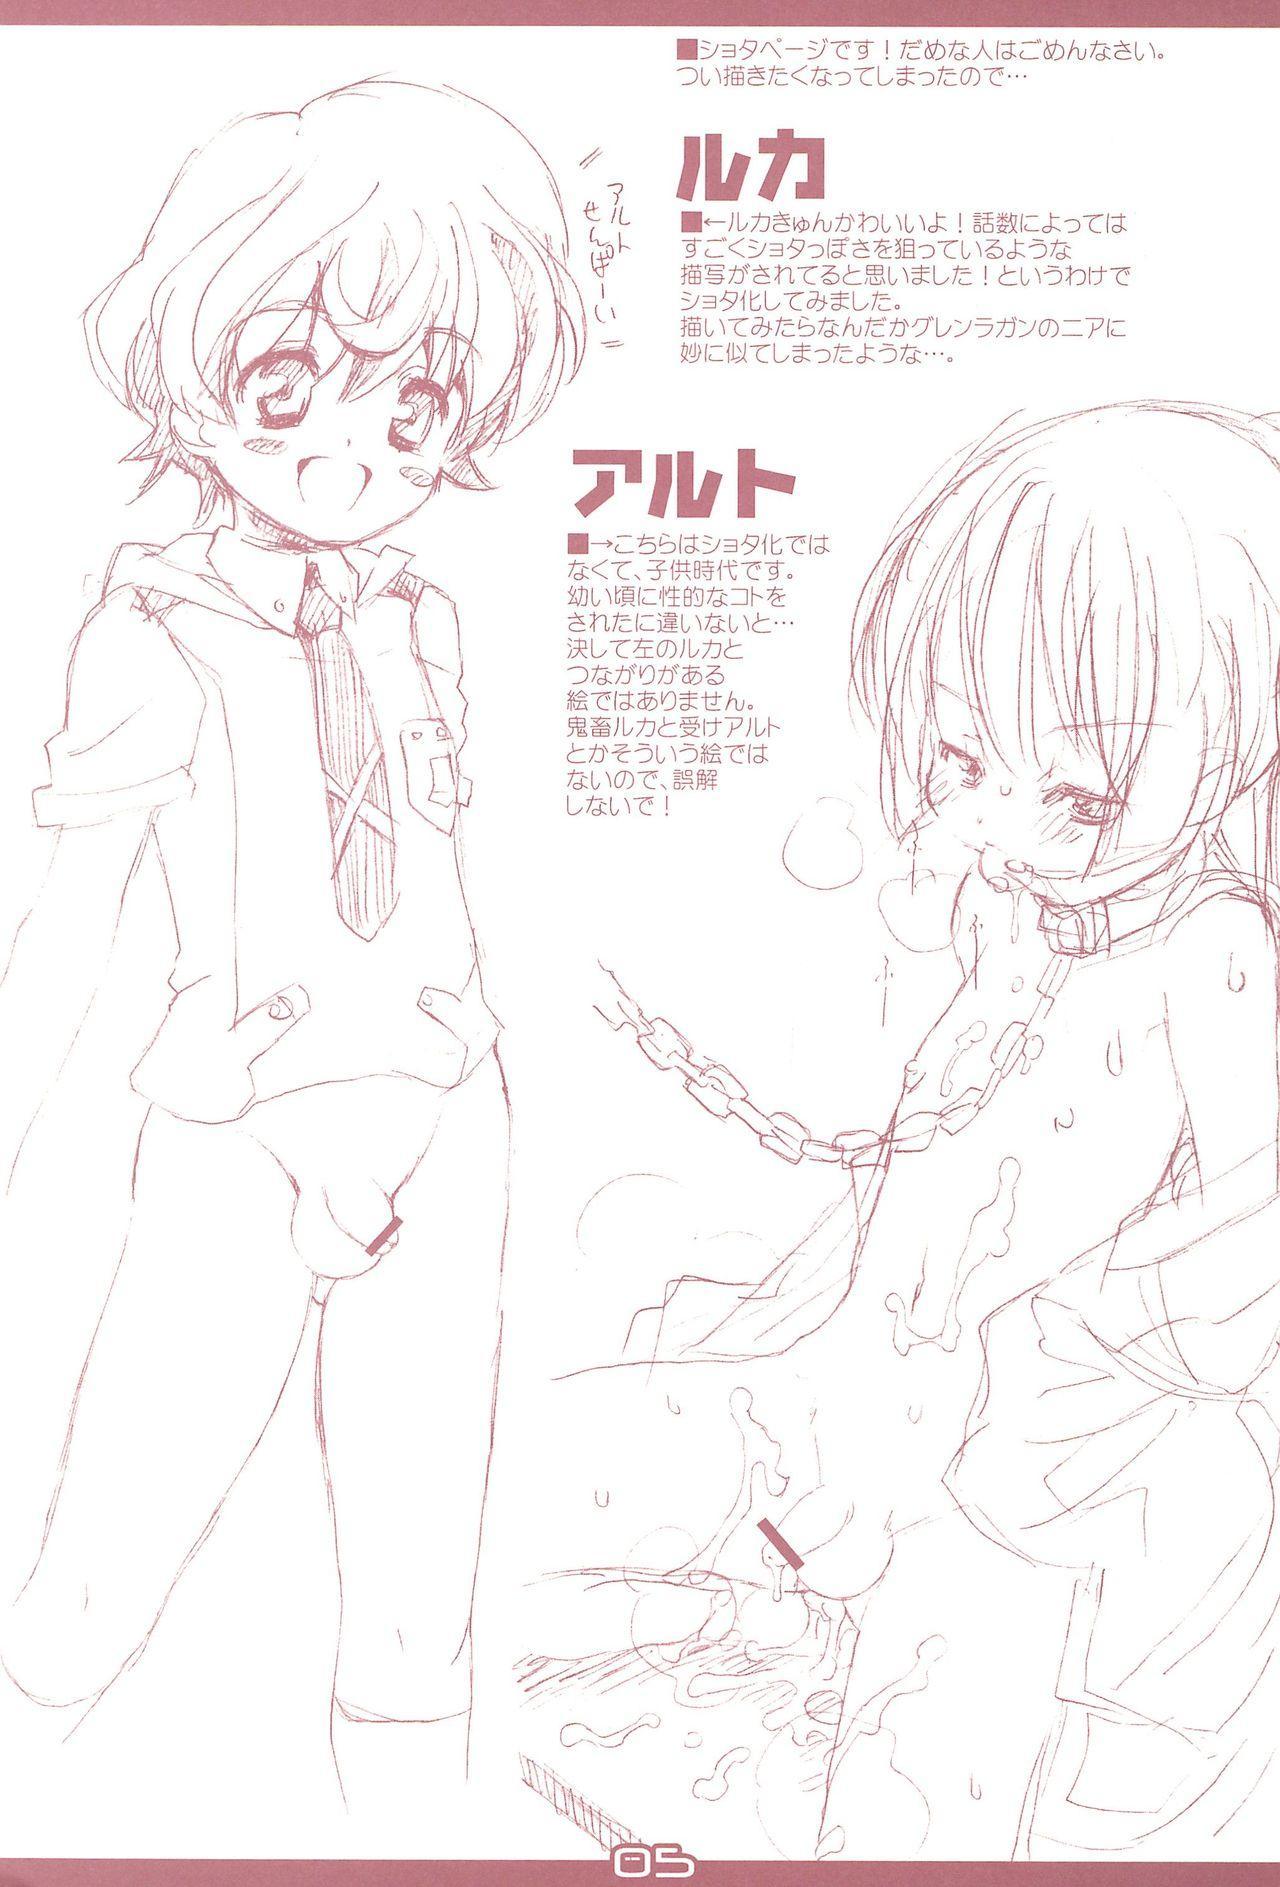 (Puniket 18) [Chokudokan (MARCY Dog, Hormone Koijirou) Rakugakitan 2 (Various) 4